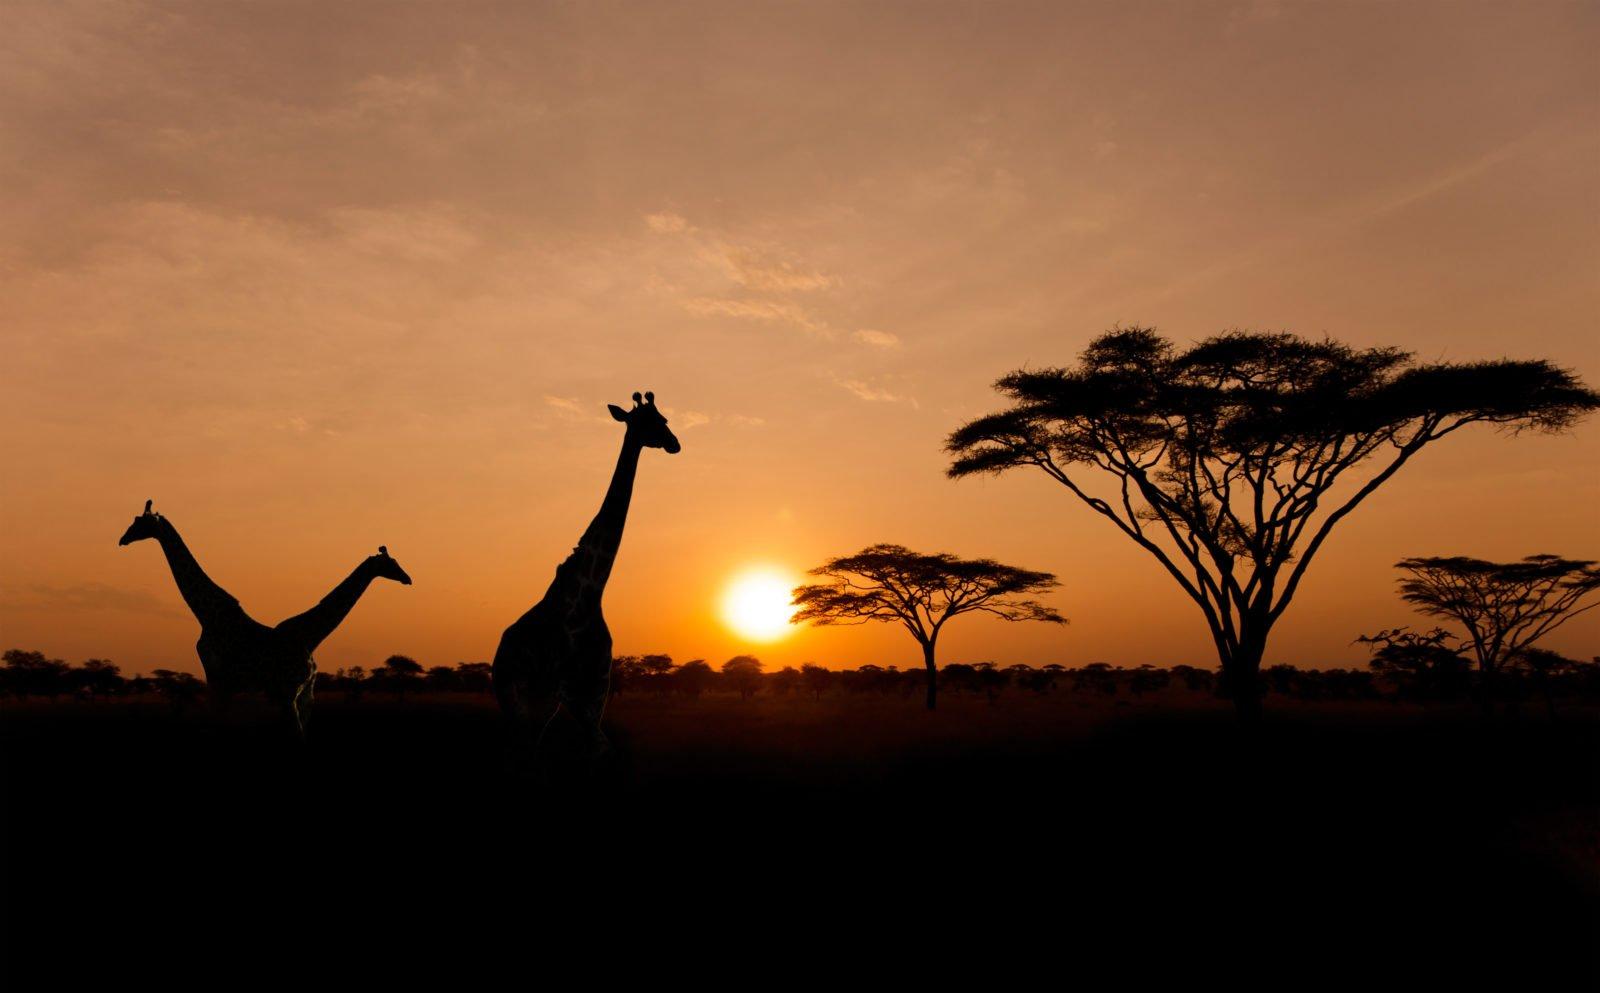 Serengeti | The Lion King | Pride Rock | Giraffe